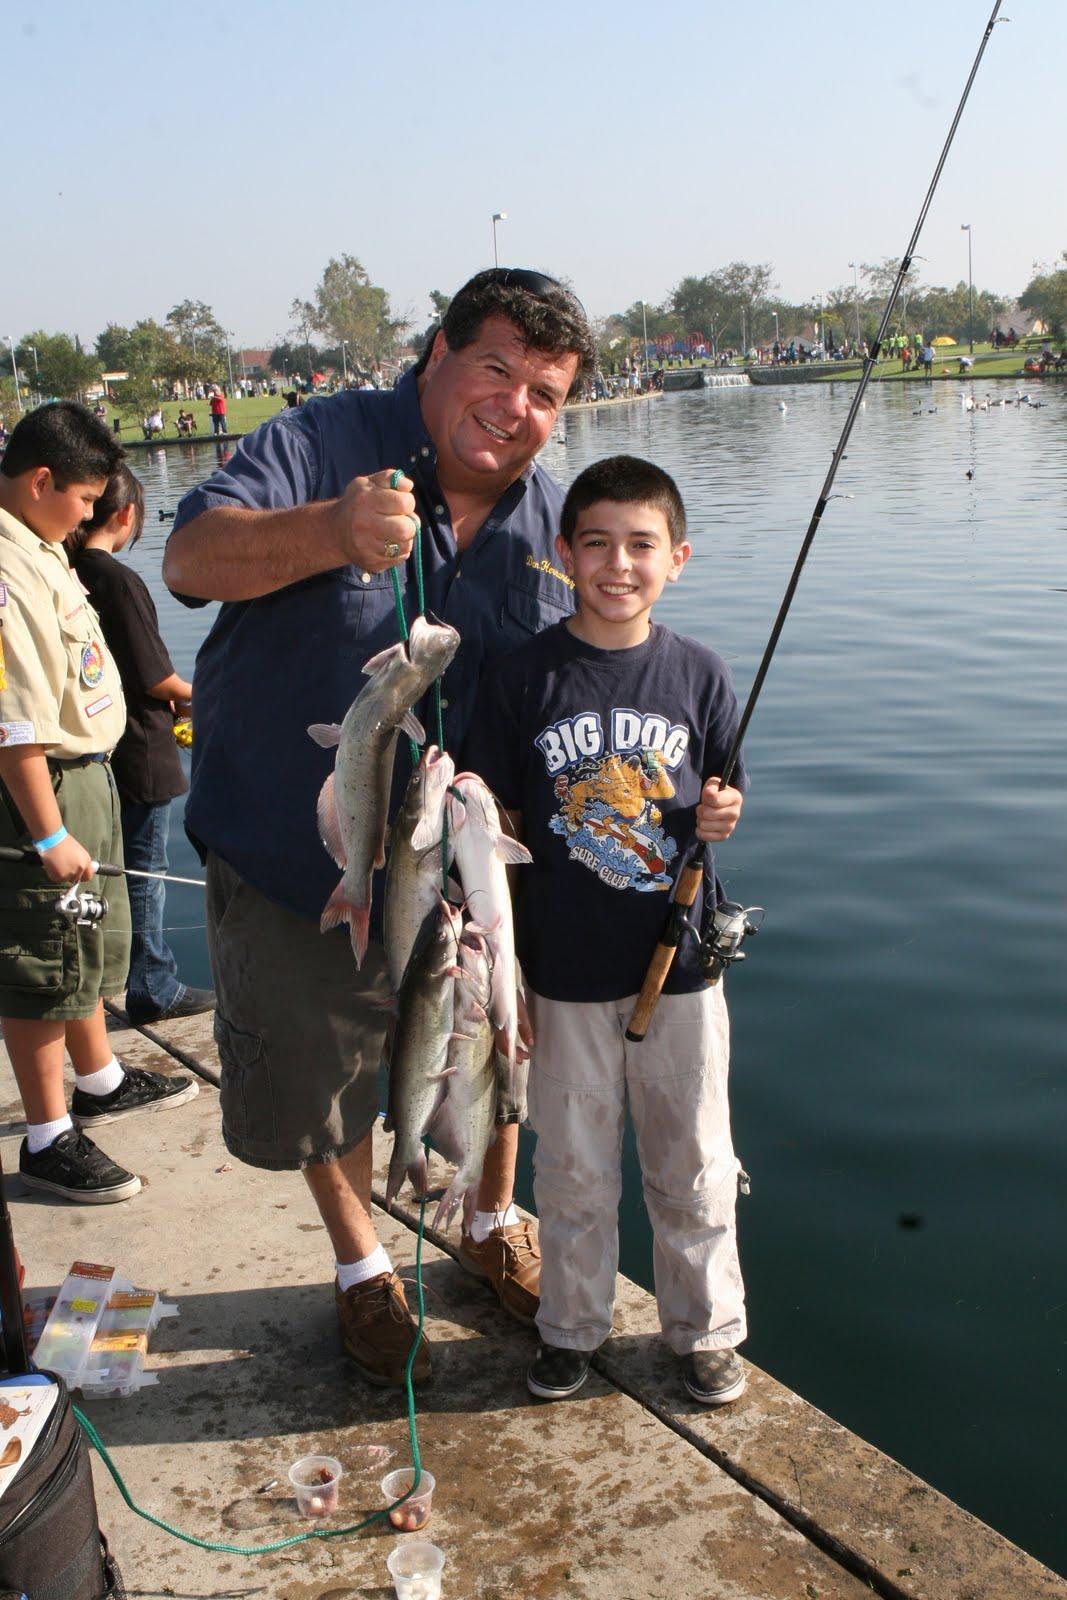 Dan 39 S Journal We Are Starting A Kids Fishing Club At Legg